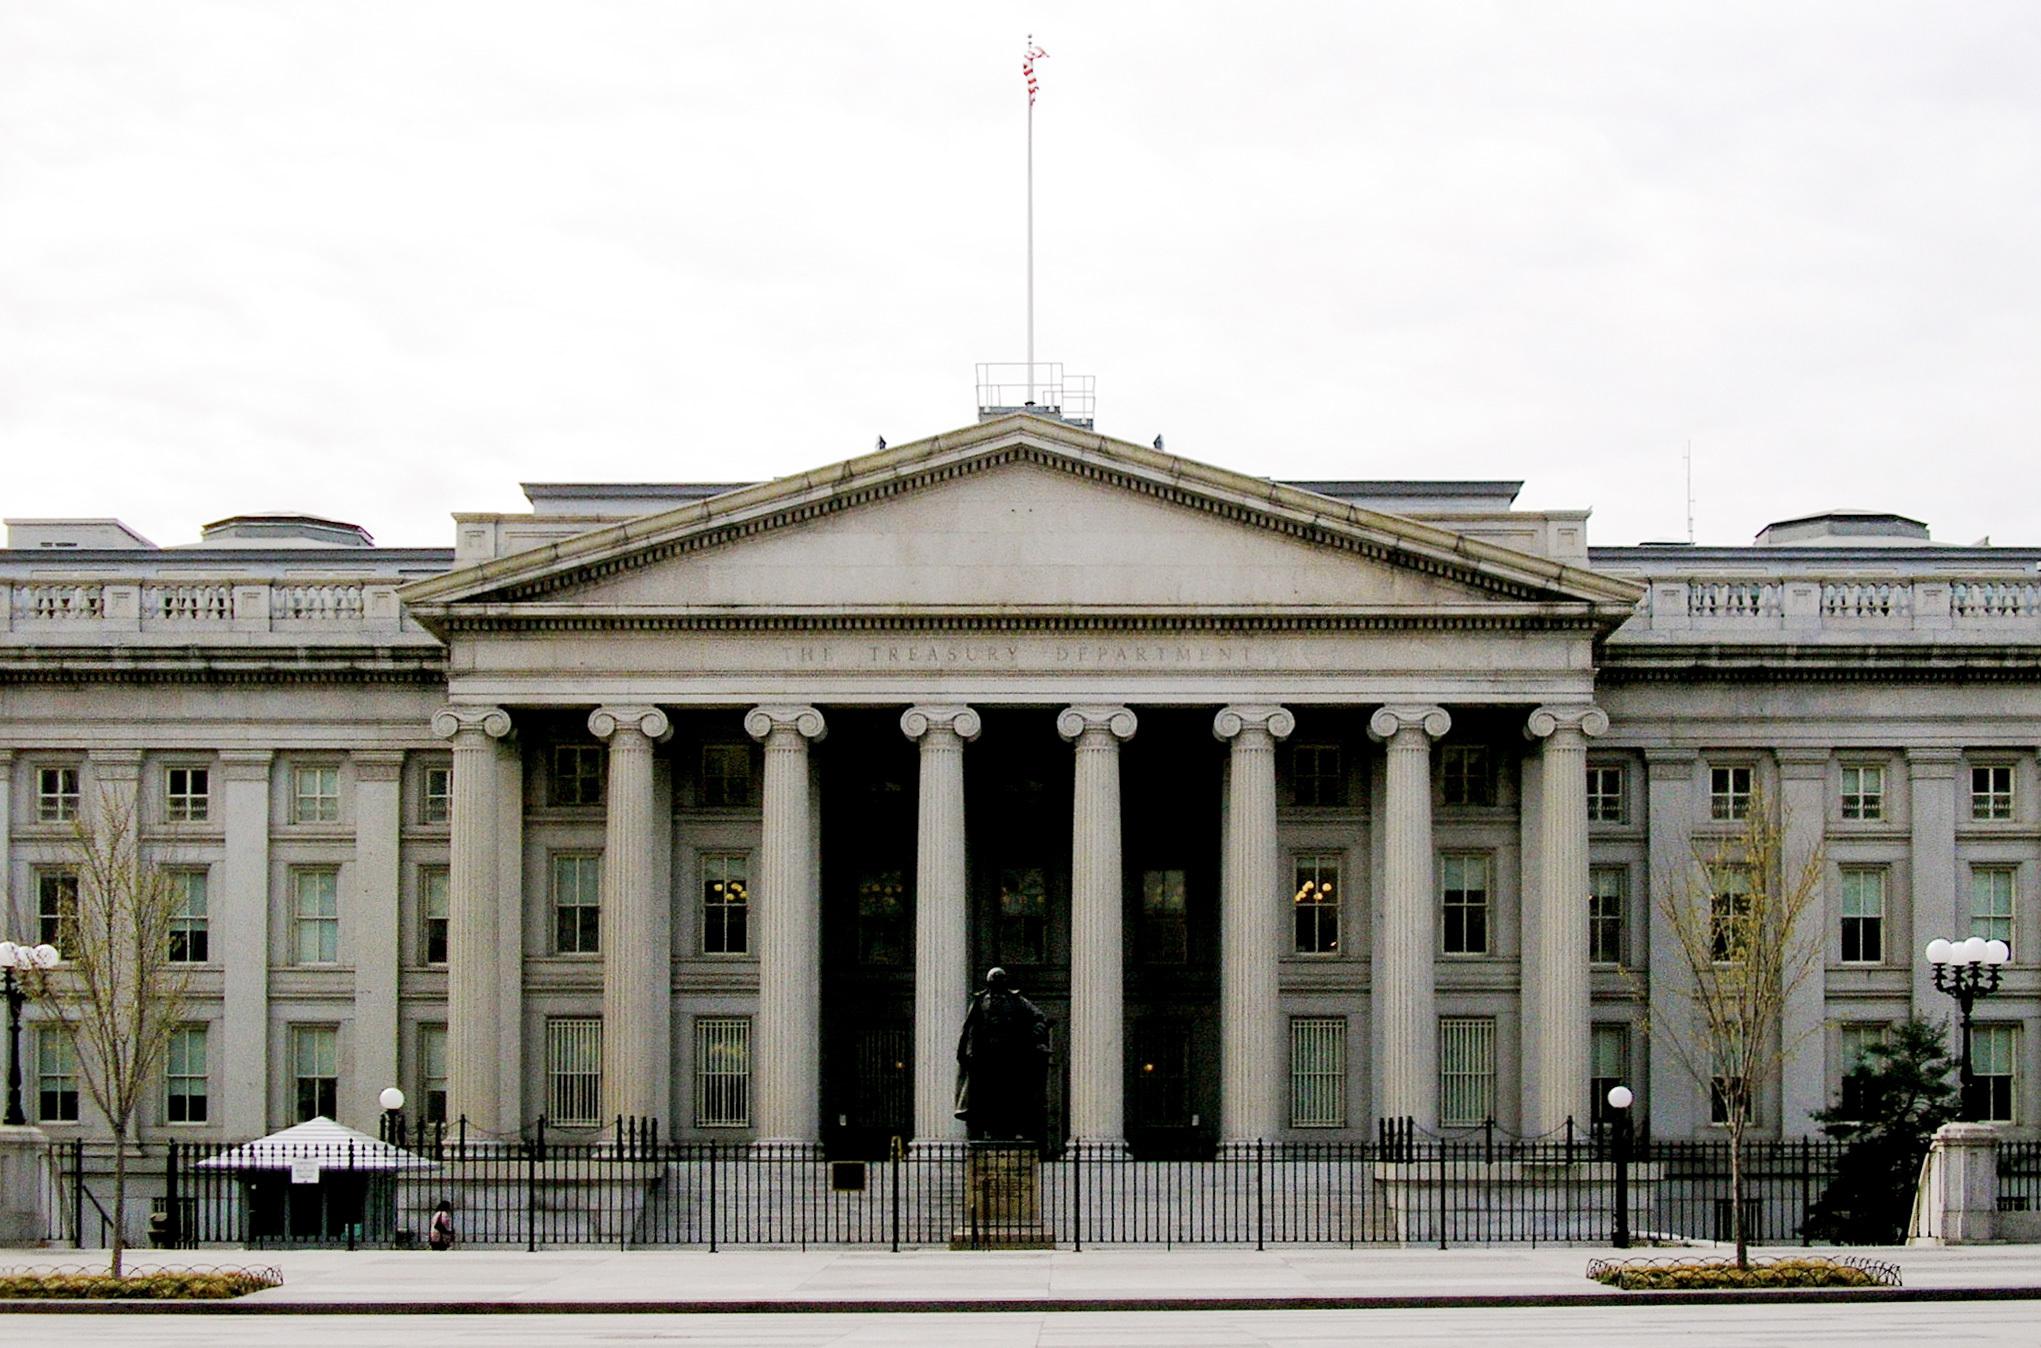 https://upload.wikimedia.org/wikipedia/commons/0/06/US_Treasury_Building.jpg